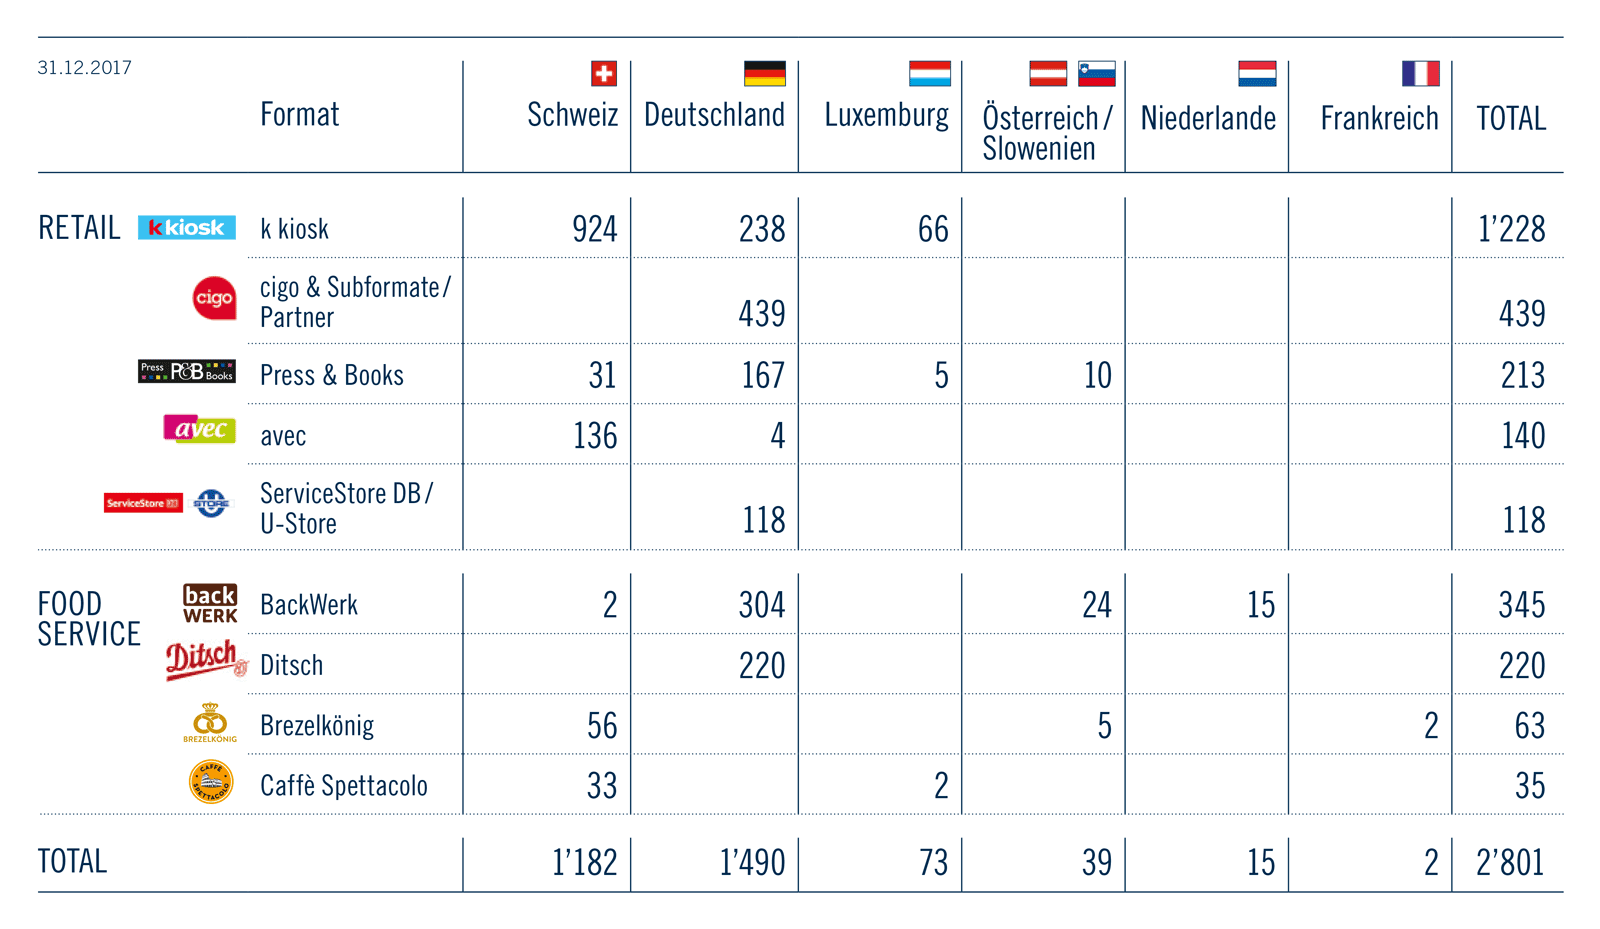 POS-Netzwerk Total / 31.12.2017